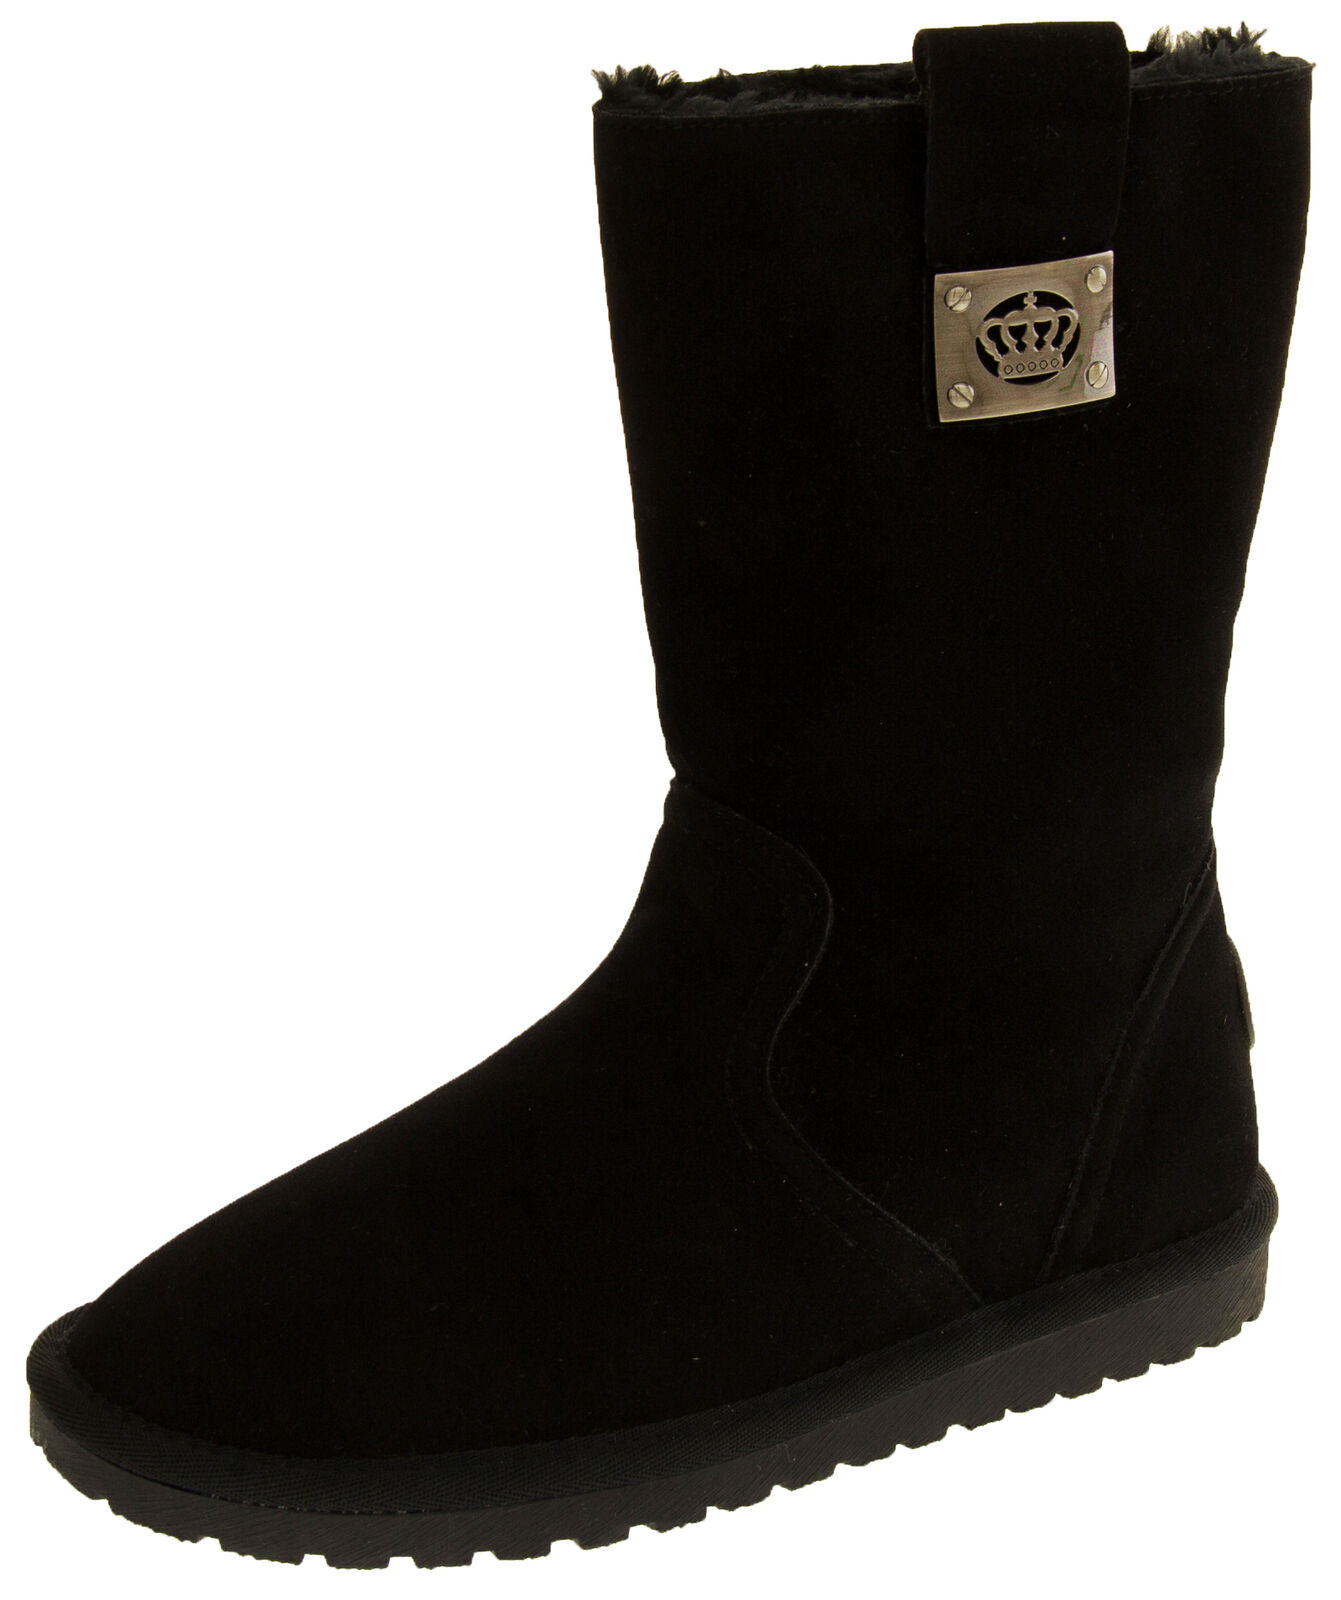 Ladies Black KEDDO Faux Suede Faux Fur Lining Warm Cosy Winter Boots Sz Size 3